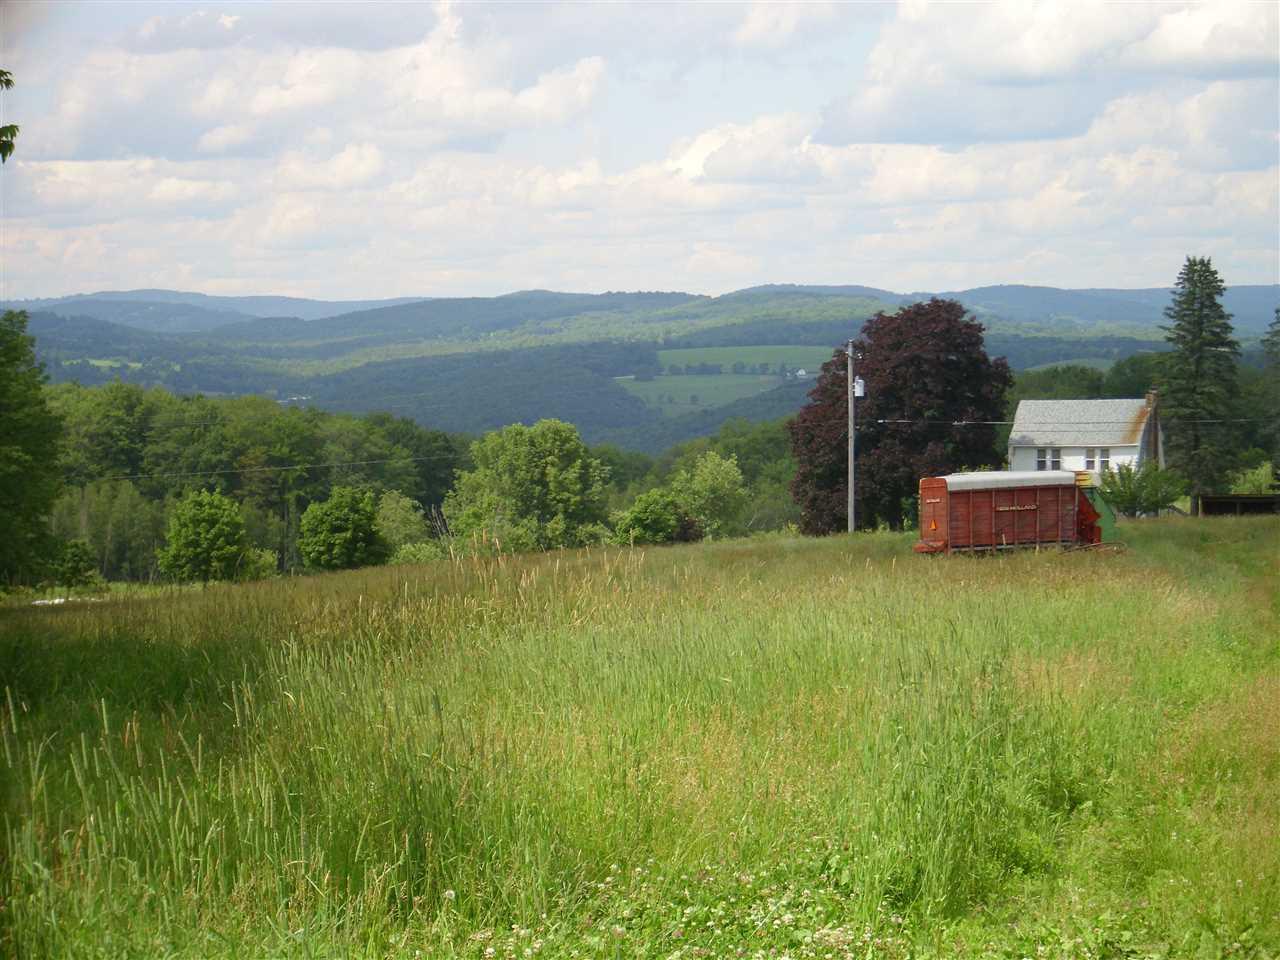 Real Estate for Sale, ListingId: 34066545, Cochecton,NY12726